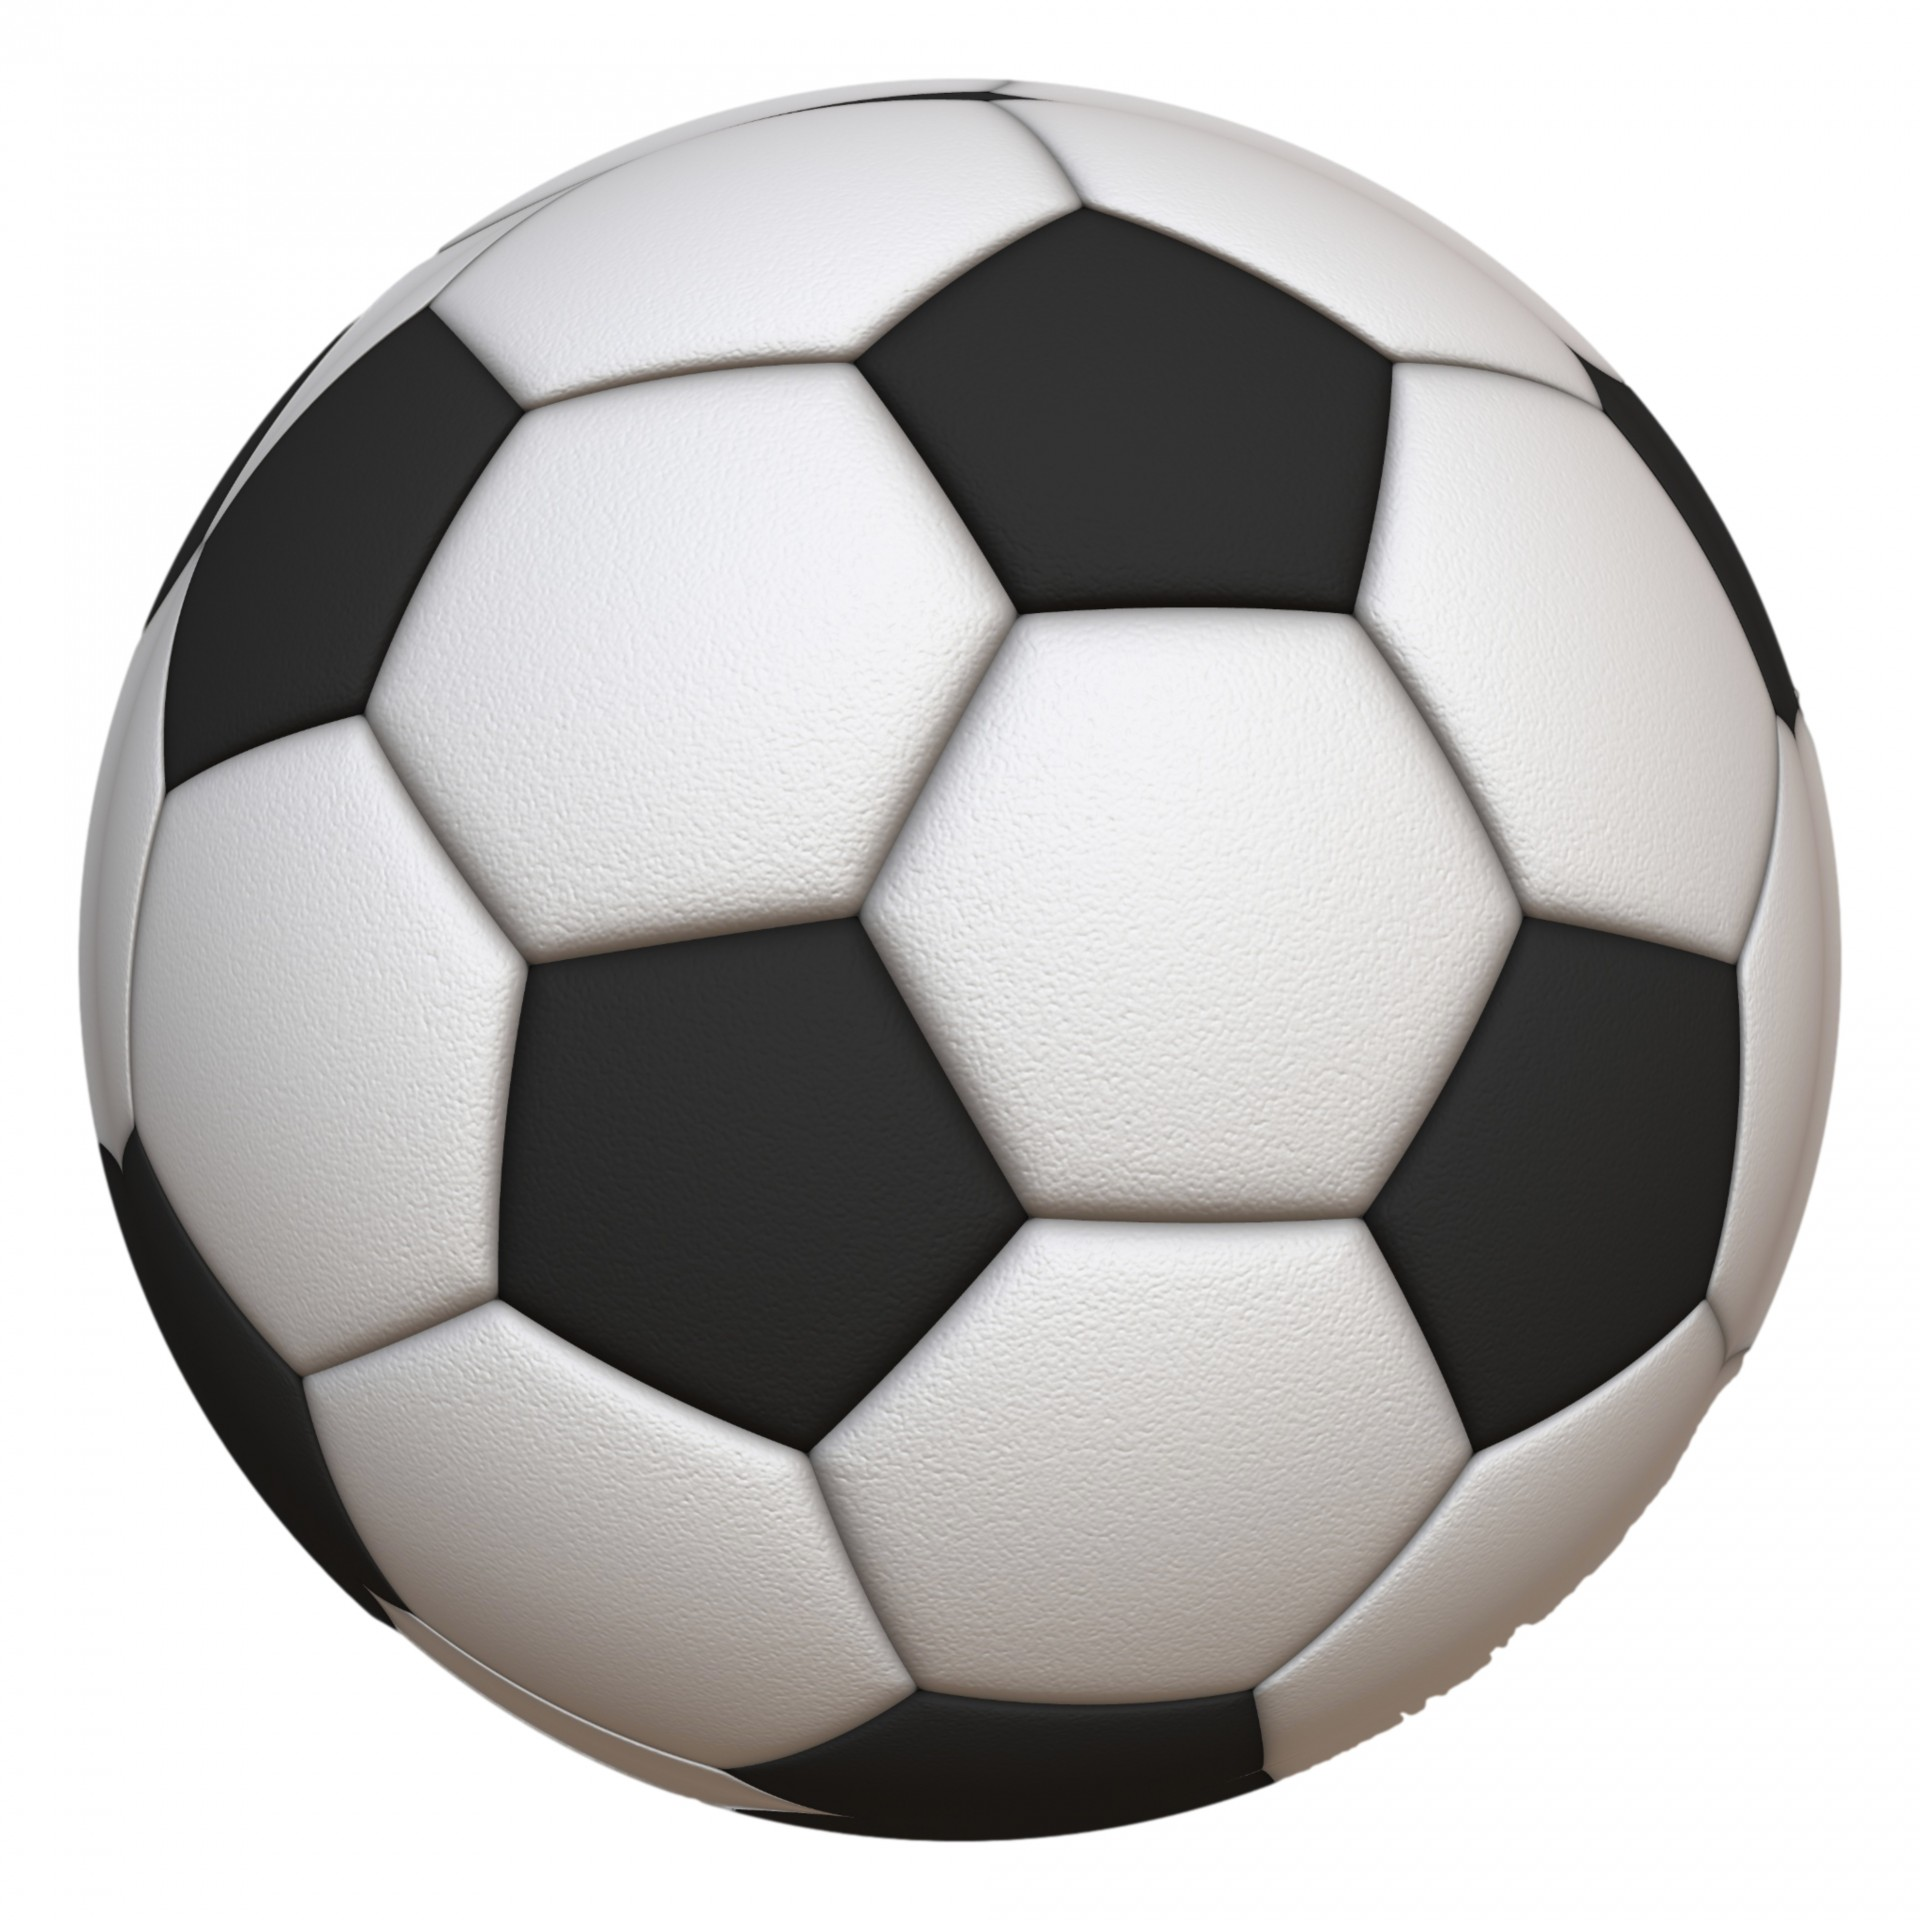 Soccer Ball 2 Free Stock Photo